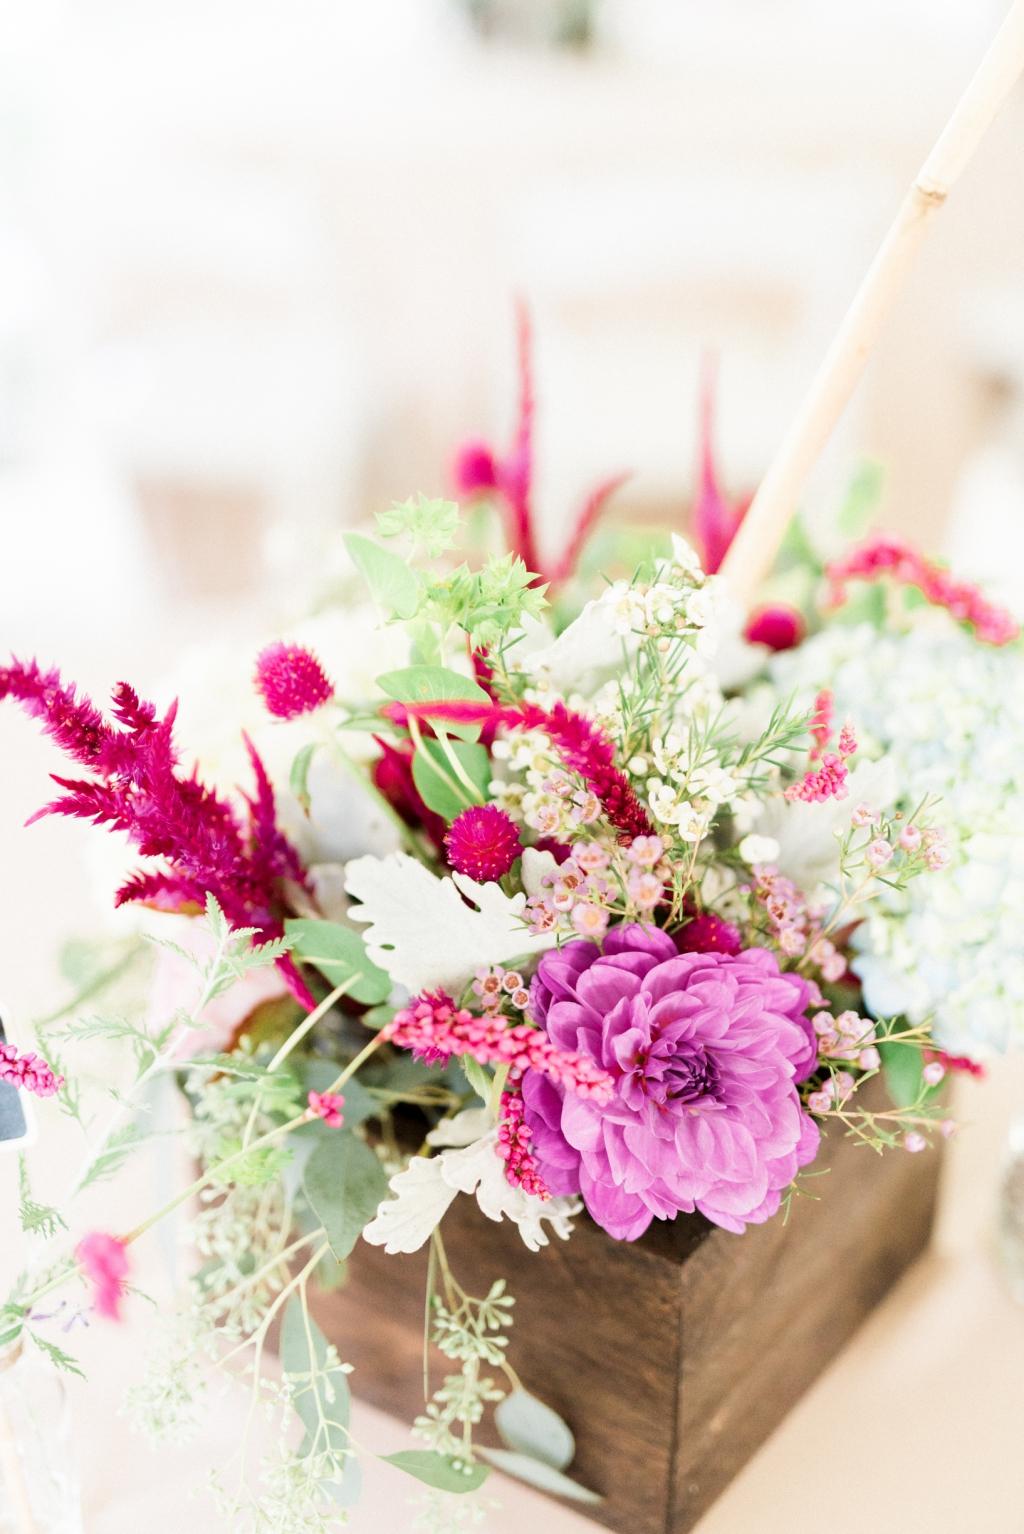 haley-richter-photography-buena-vista-confrence-center-wedding-summer-110